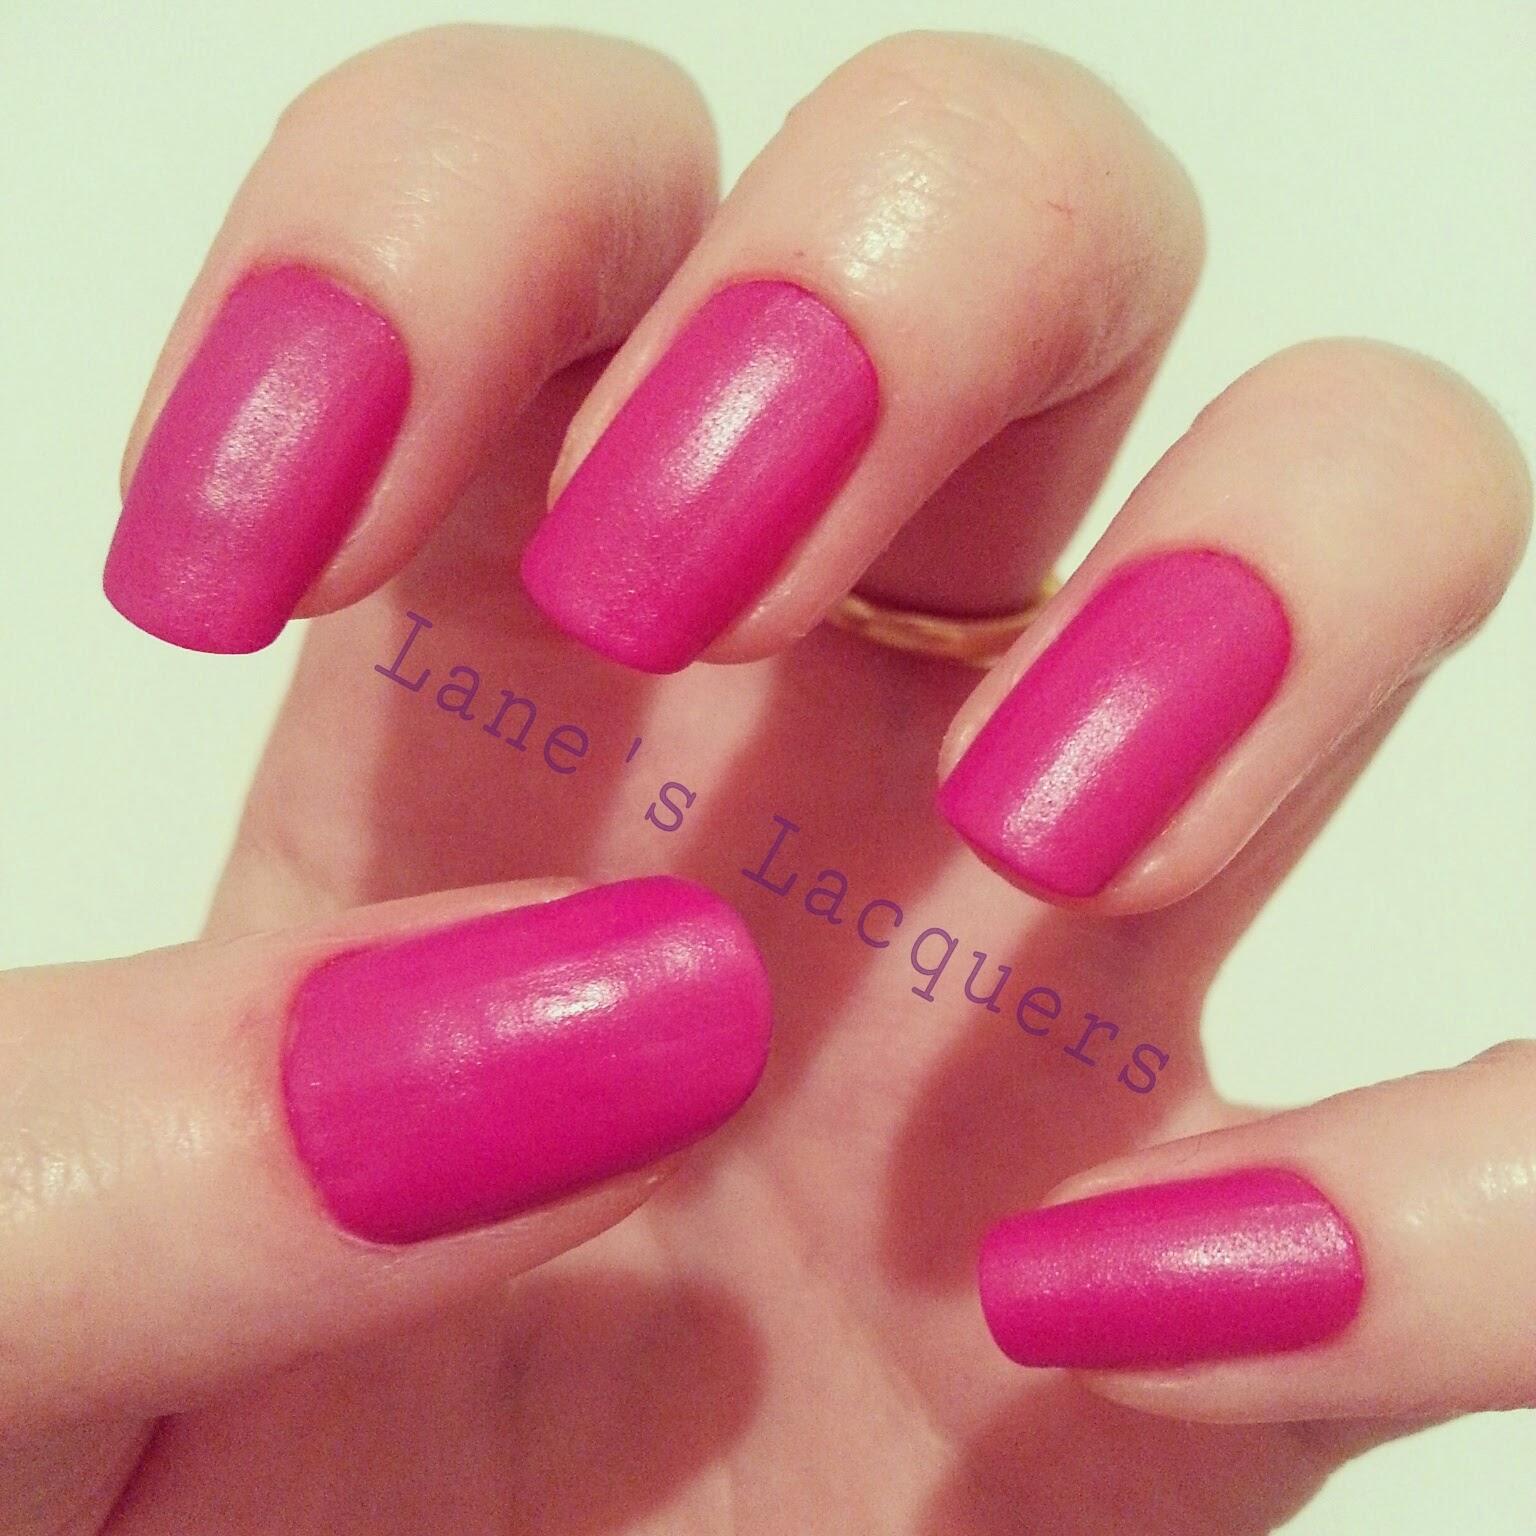 barry-m-rhossili-swatch-manicure (1)